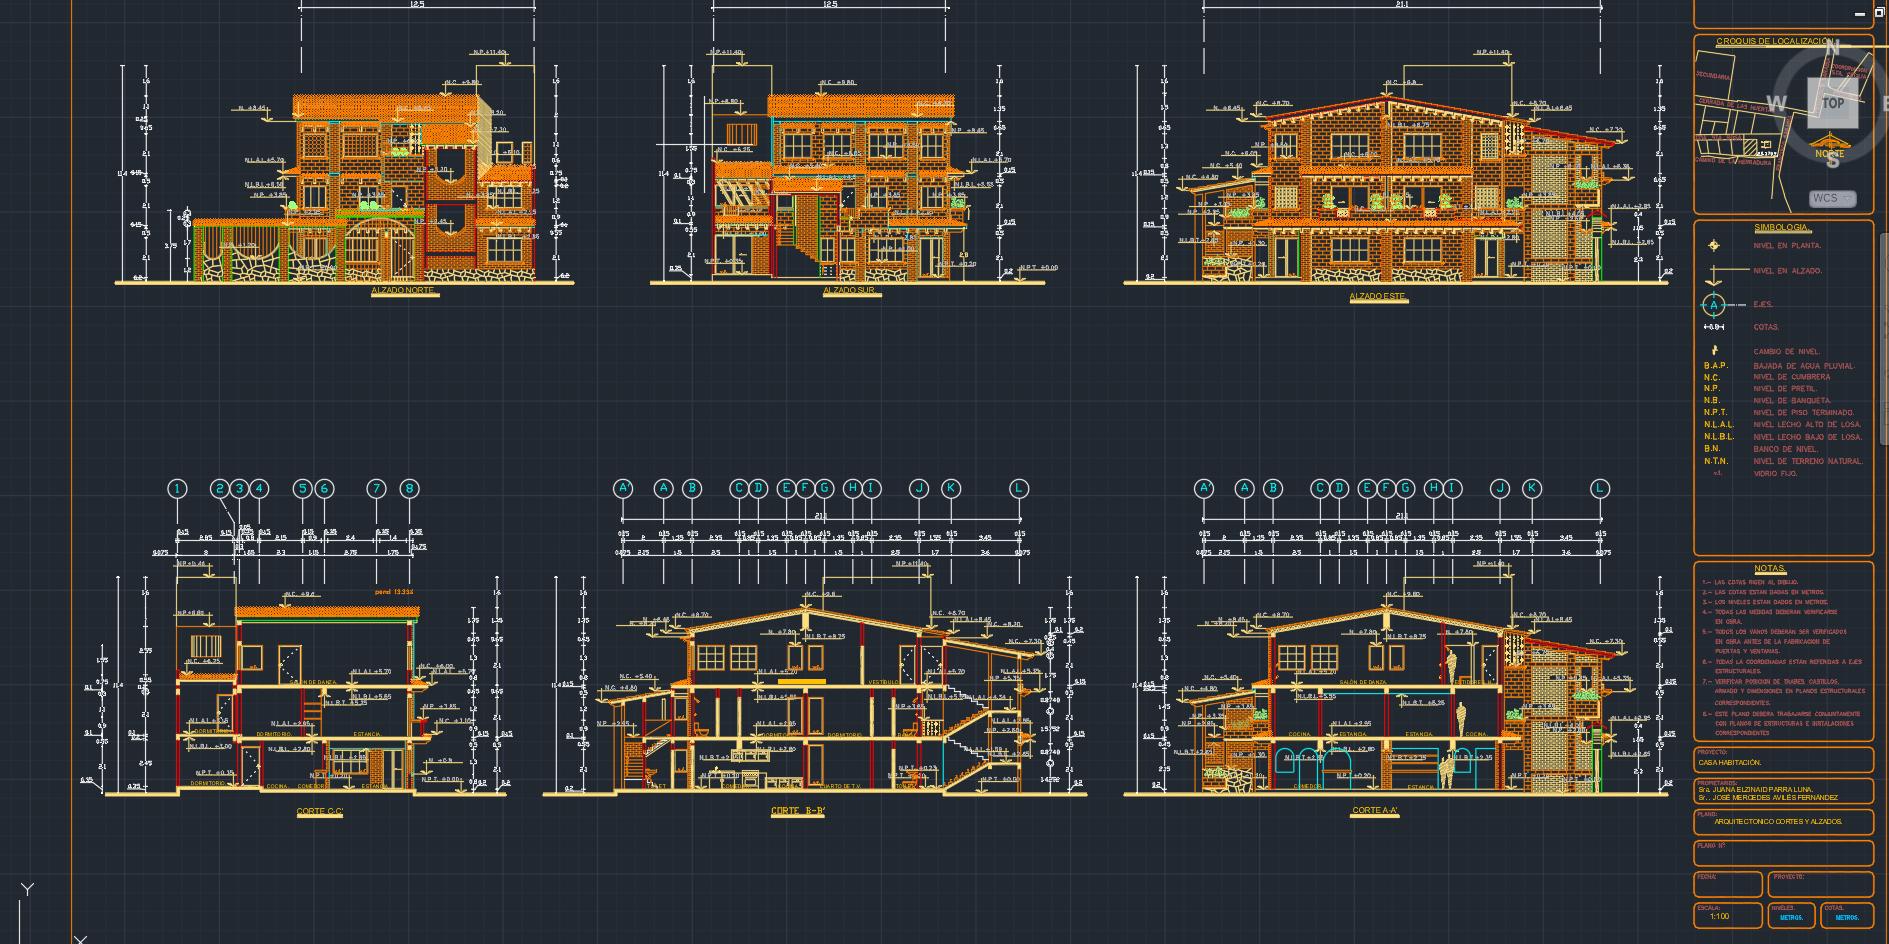 Descarga gratis planos de casa constructivos y detalles for Planos arquitectonicos de casas gratis